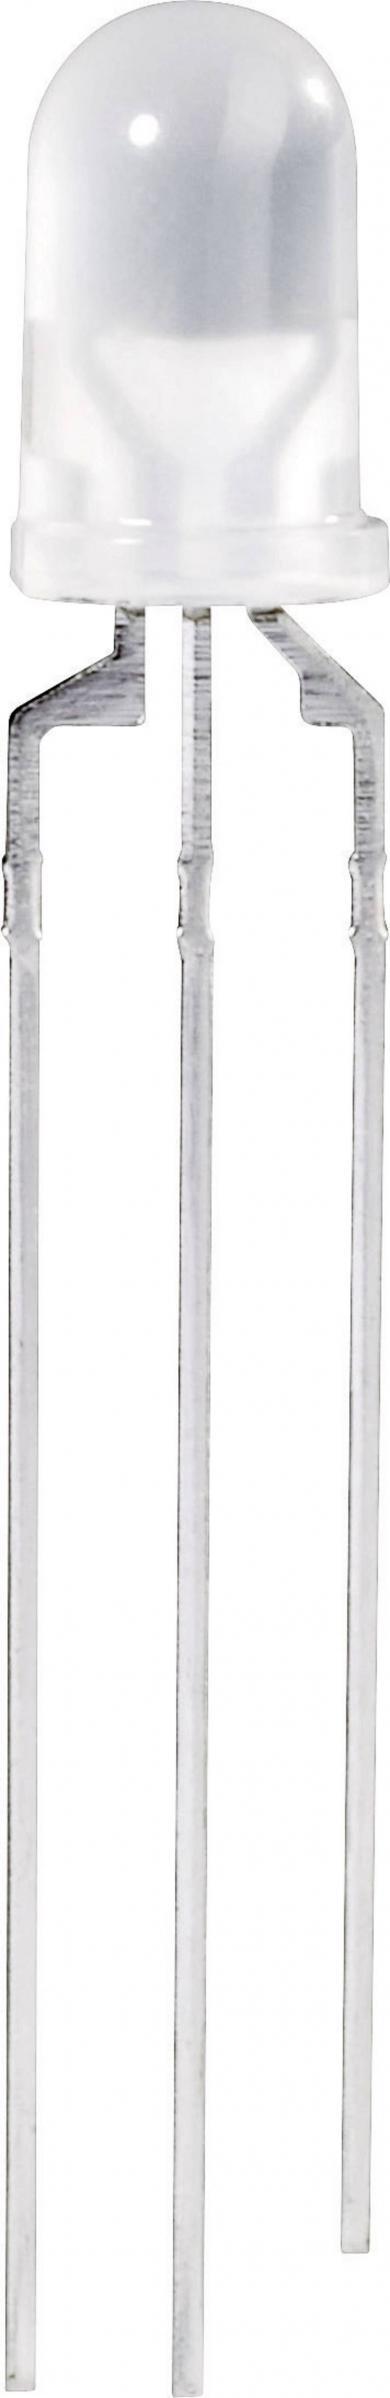 Led bicolor 5 mm, CQX 95 / WU-1-91EWG, roșu / verde, 60°, tipul carcasei 5 mm, 90/70 mcd